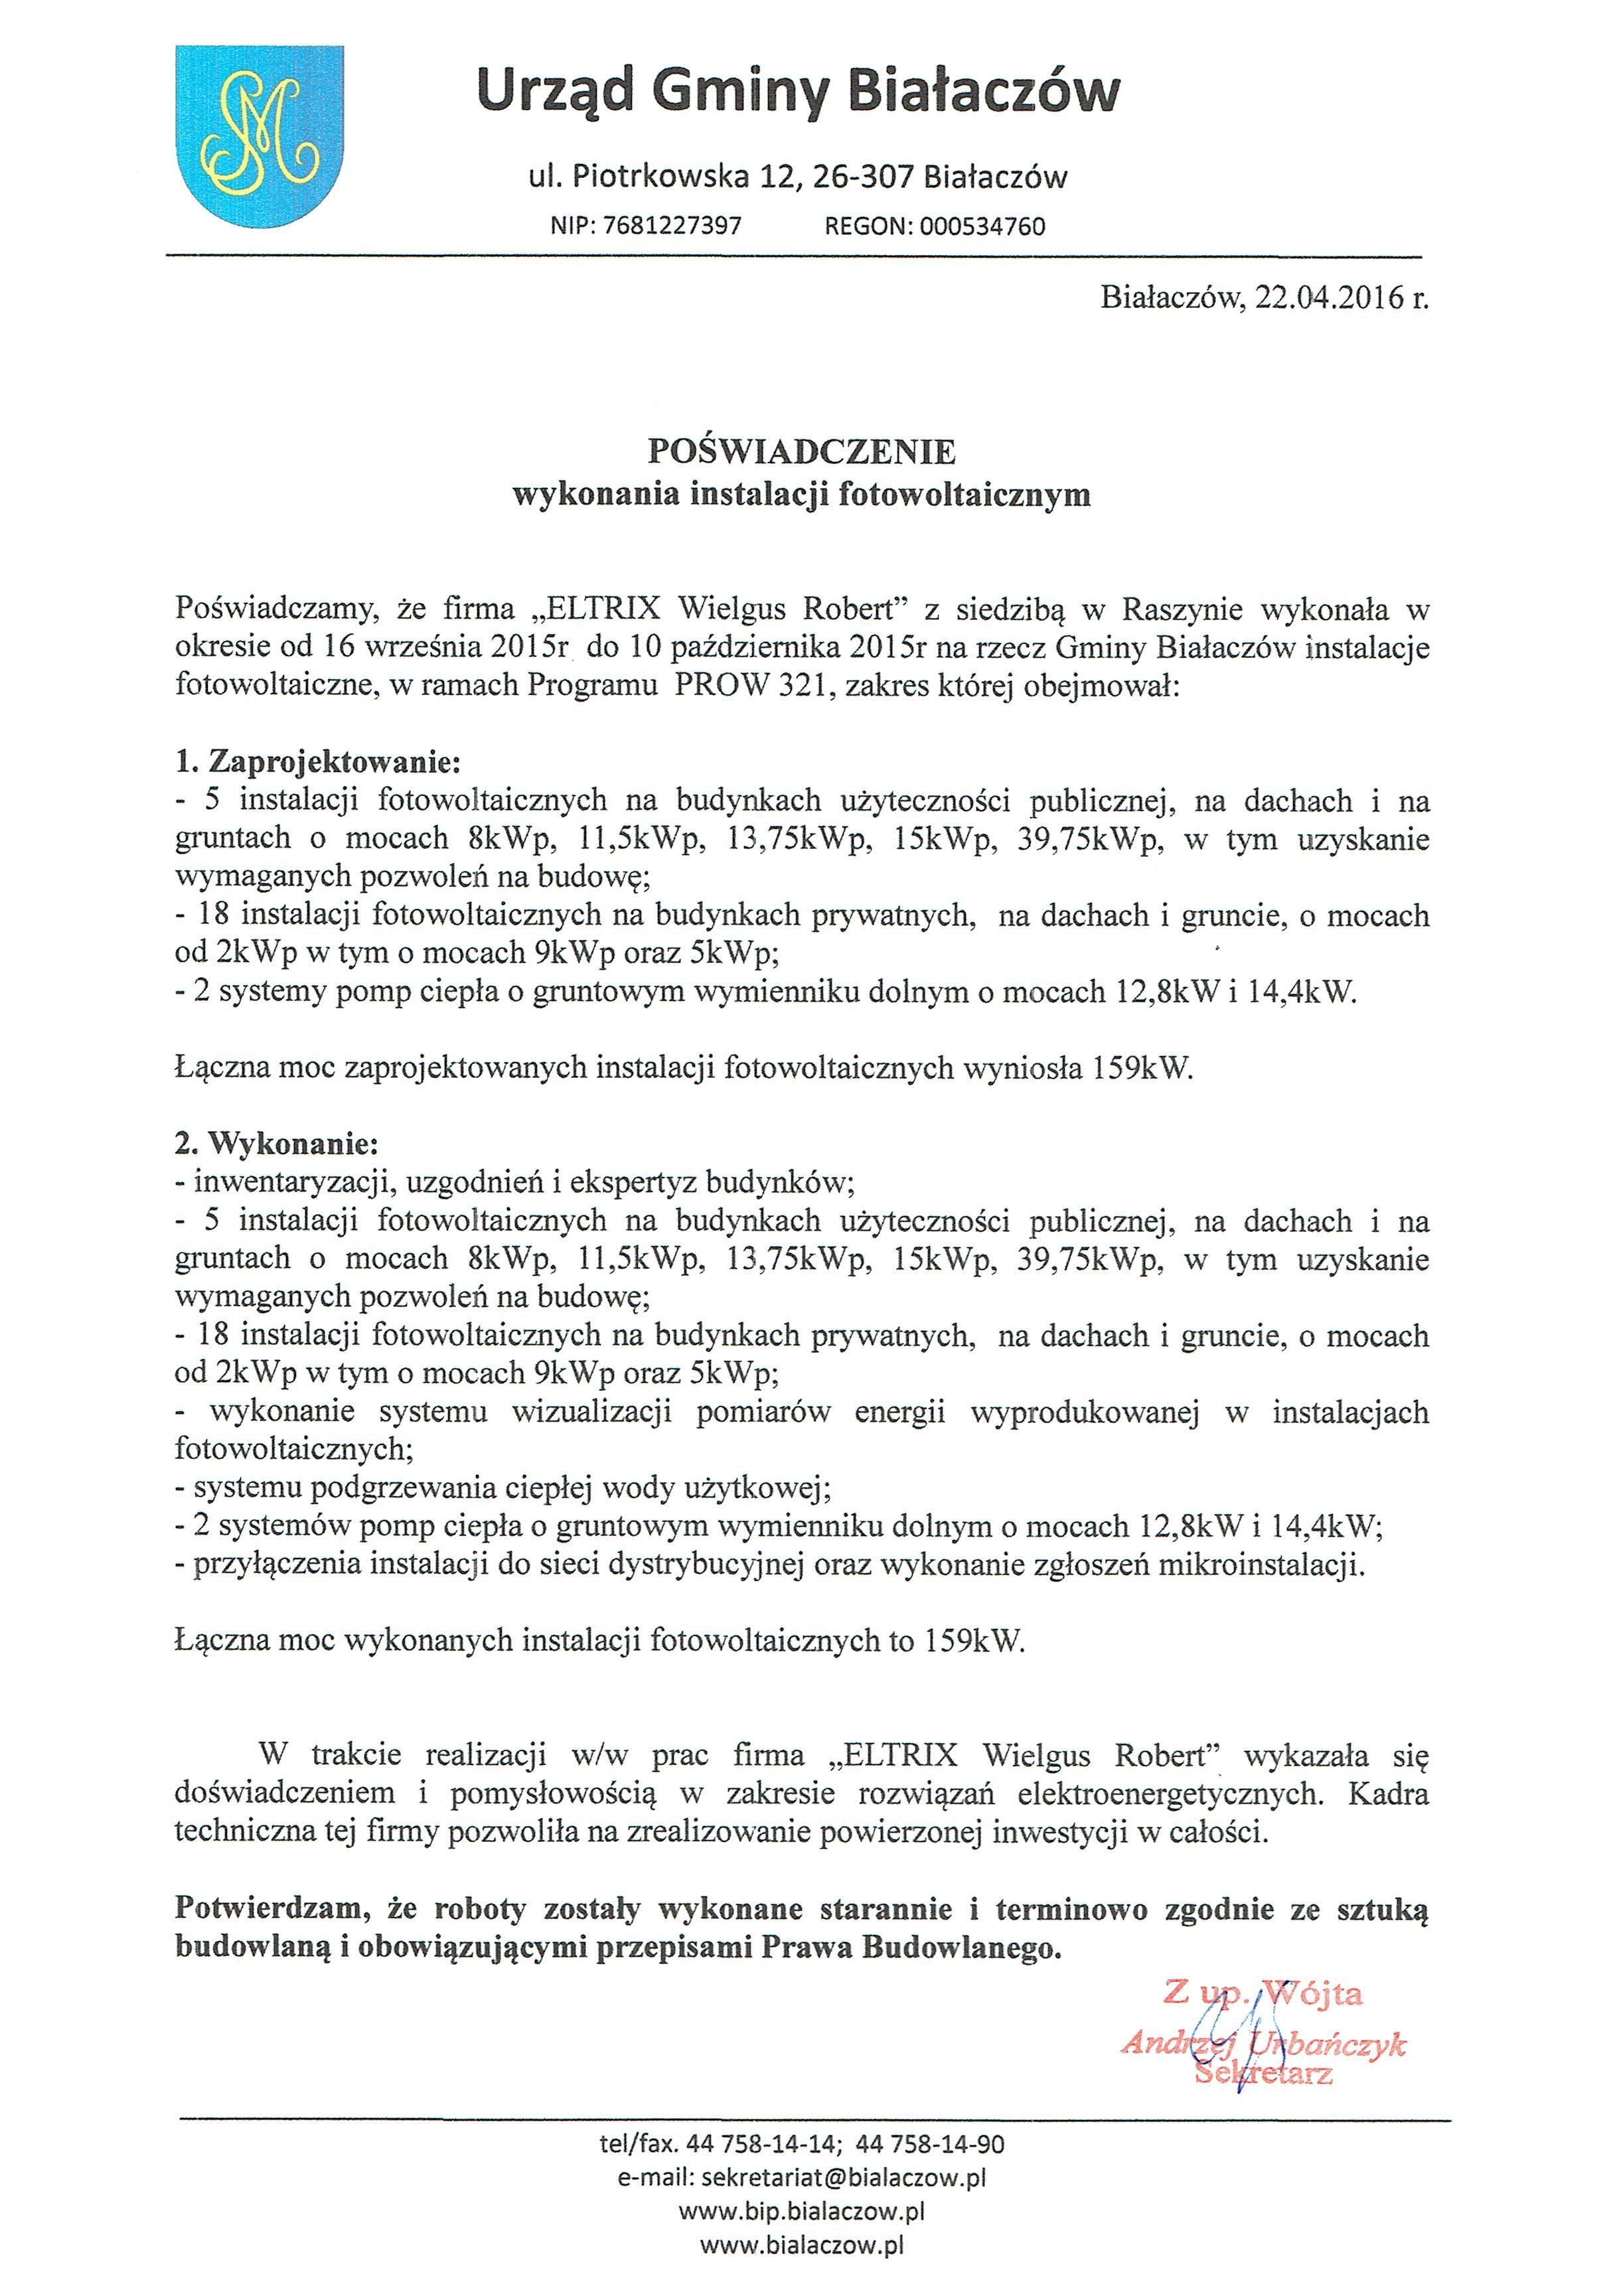 gmina-bialaczow